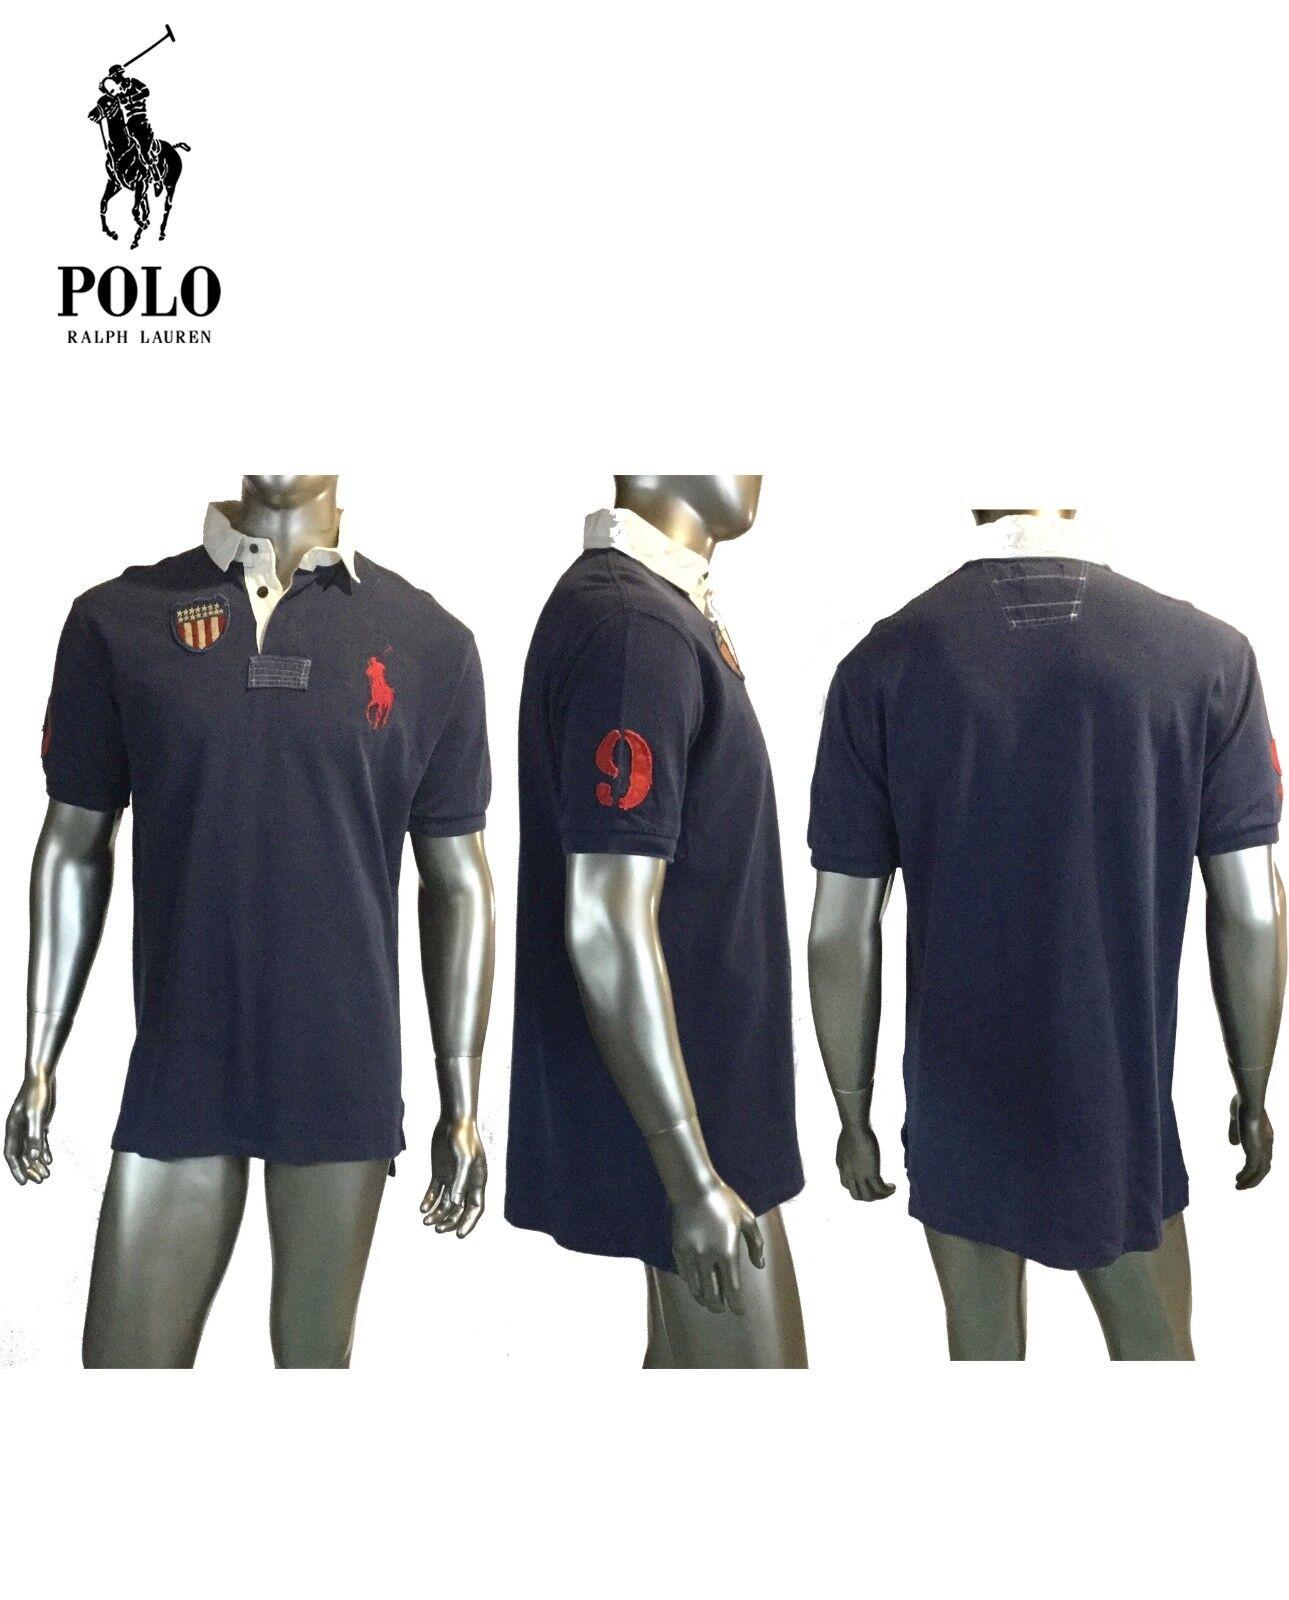 Vintage Ralph Lauren, Mens 90's Navy Polo Shirt Rugby,USA Big Pony, L